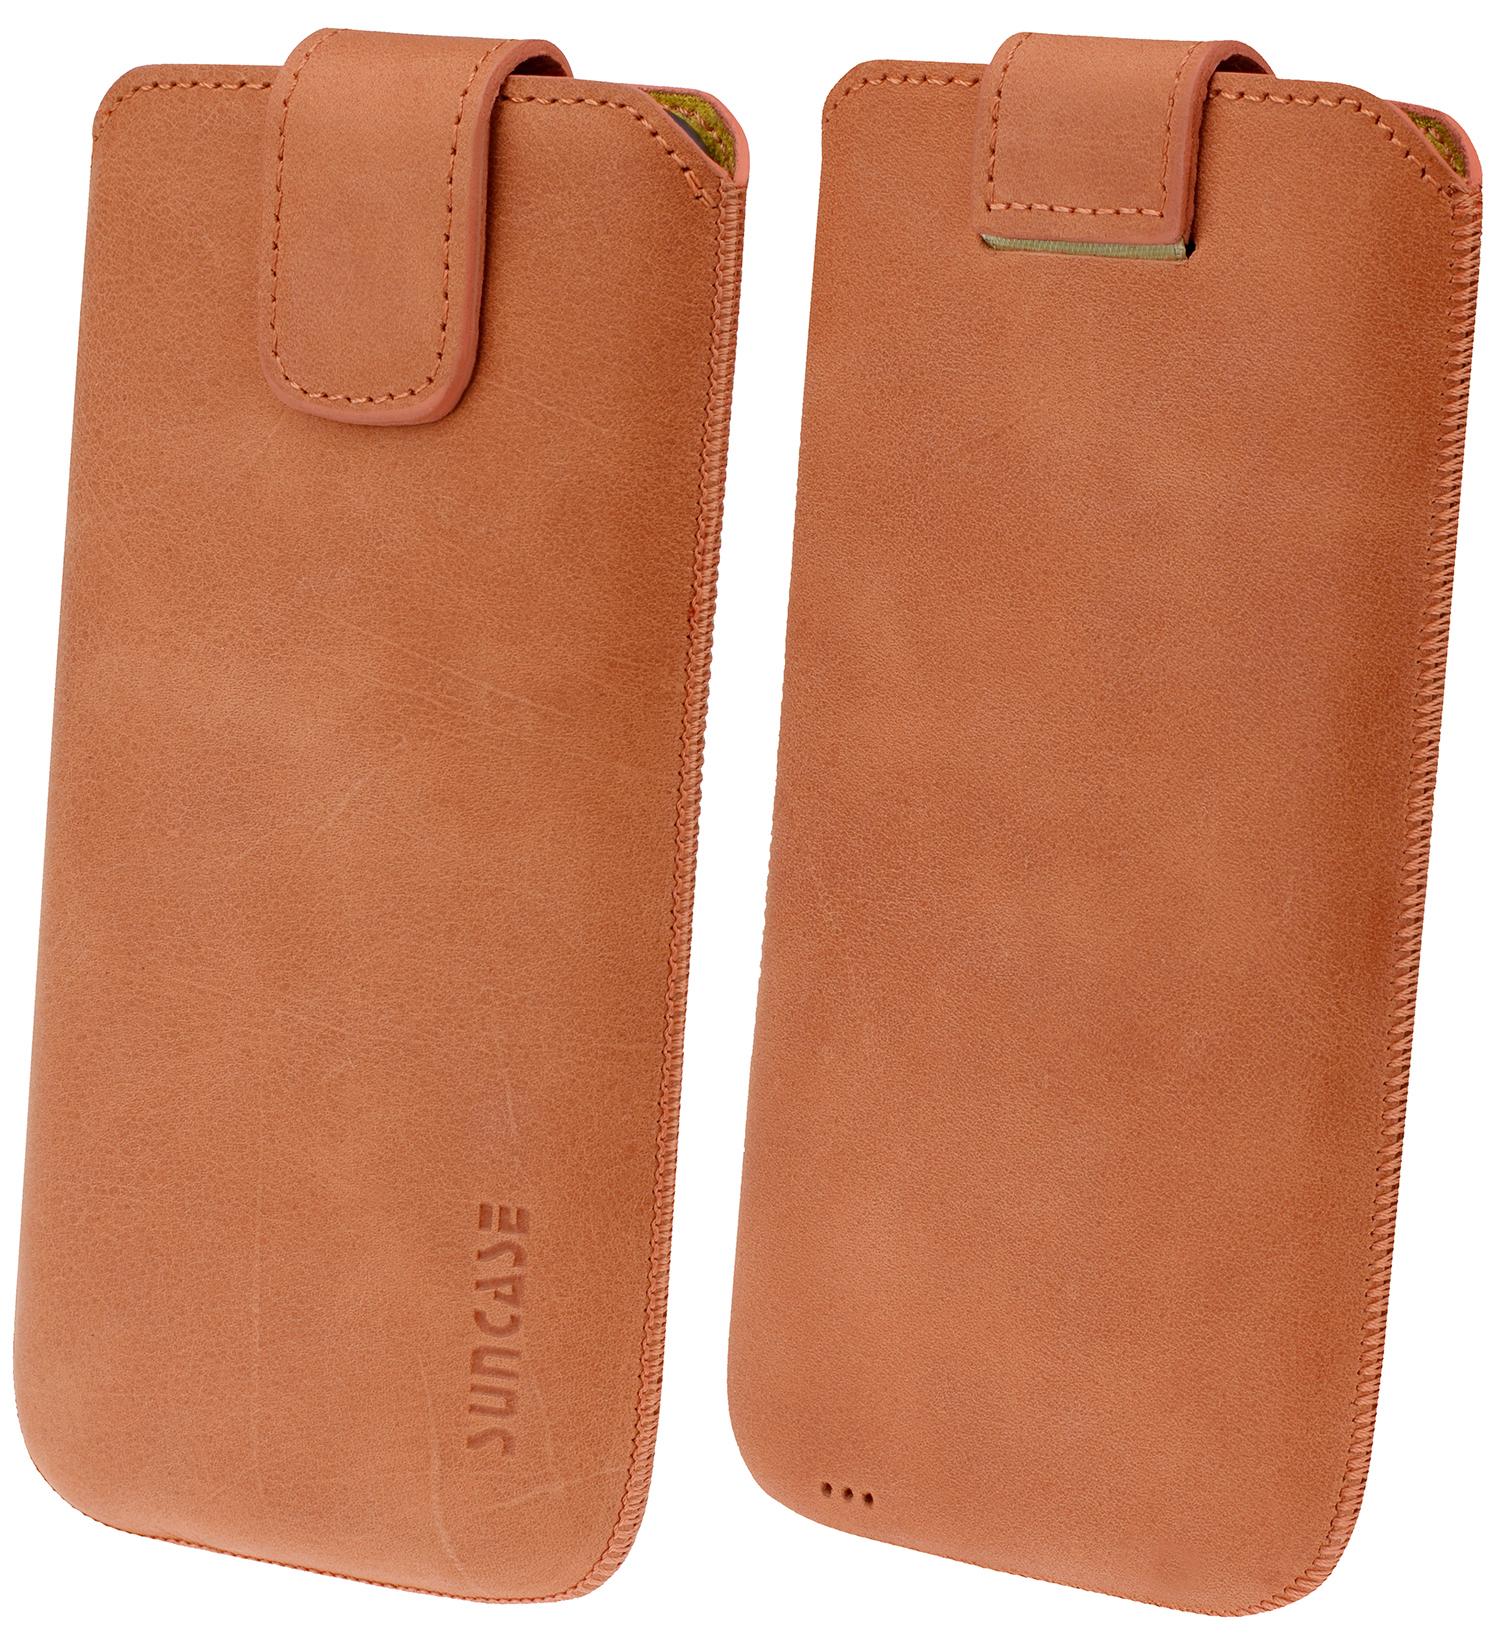 Samsung-Galaxy-A6-2018-Tasche-Ledertasche-Huelle-Schutzhuelle-inkl-Silikon-Case